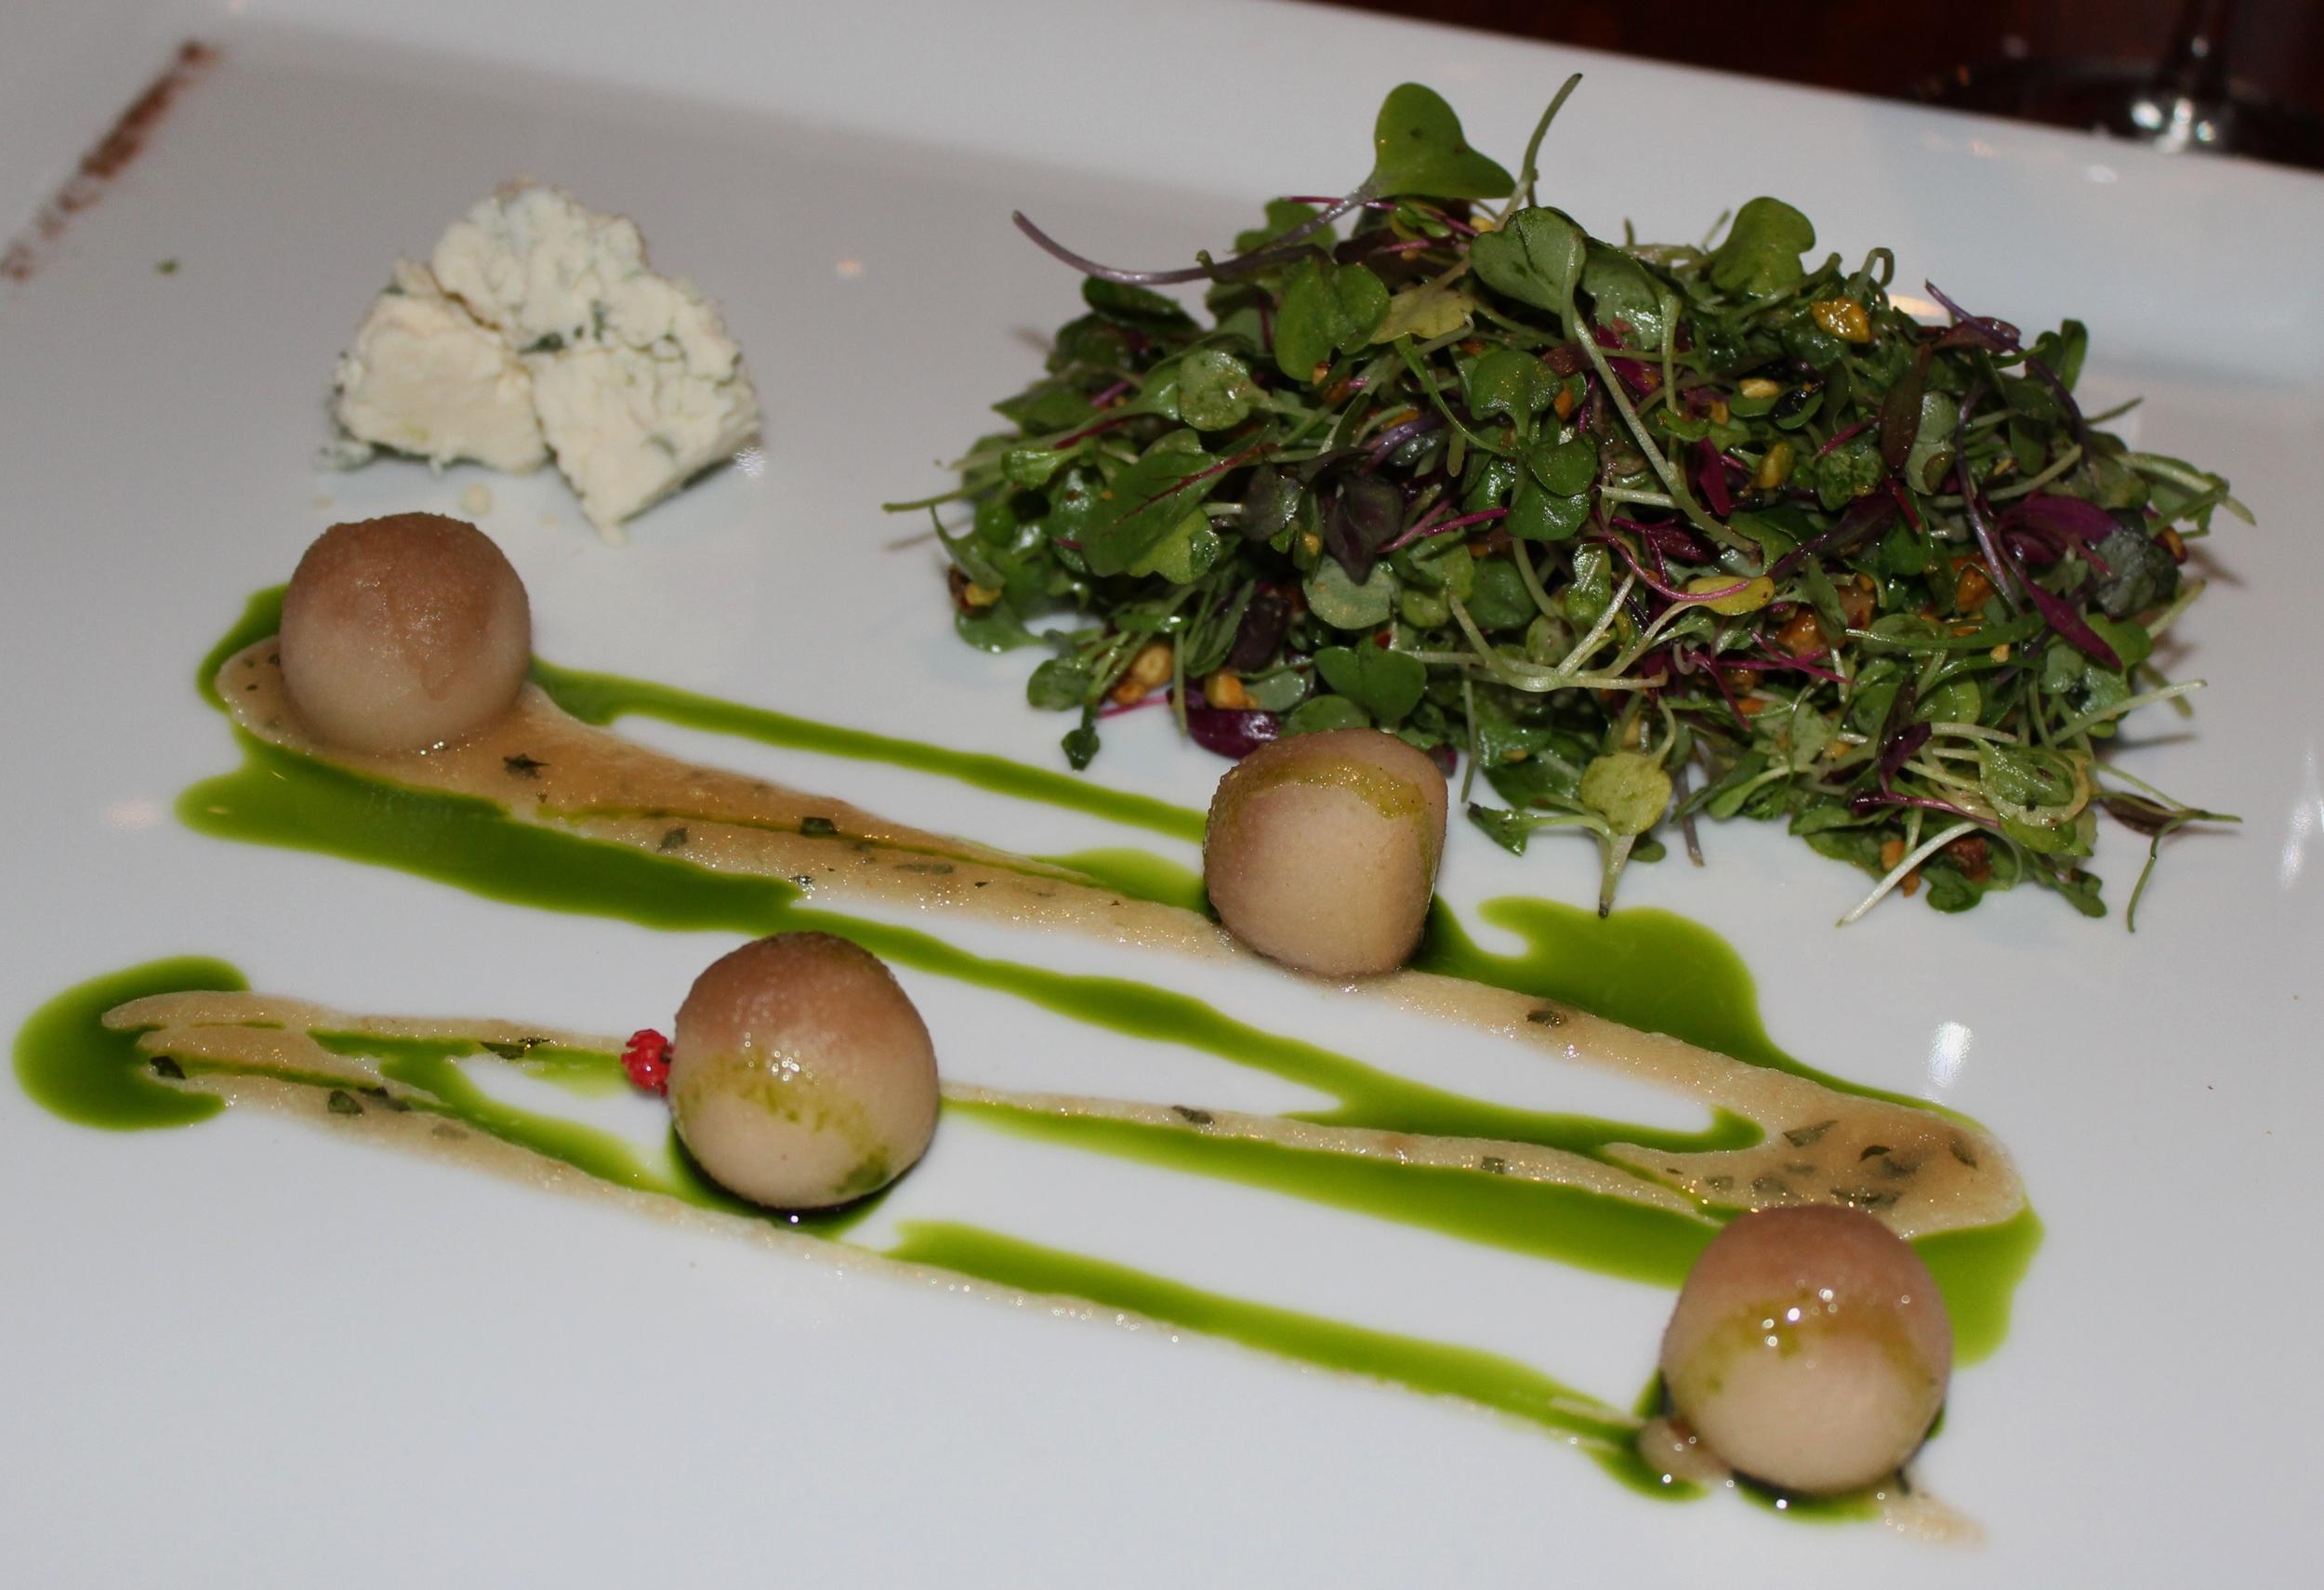 Cider-Poached Pear, Micro Herbs. Gorgonzola, Caramelized Pear-Cinnamon Vinaigrette